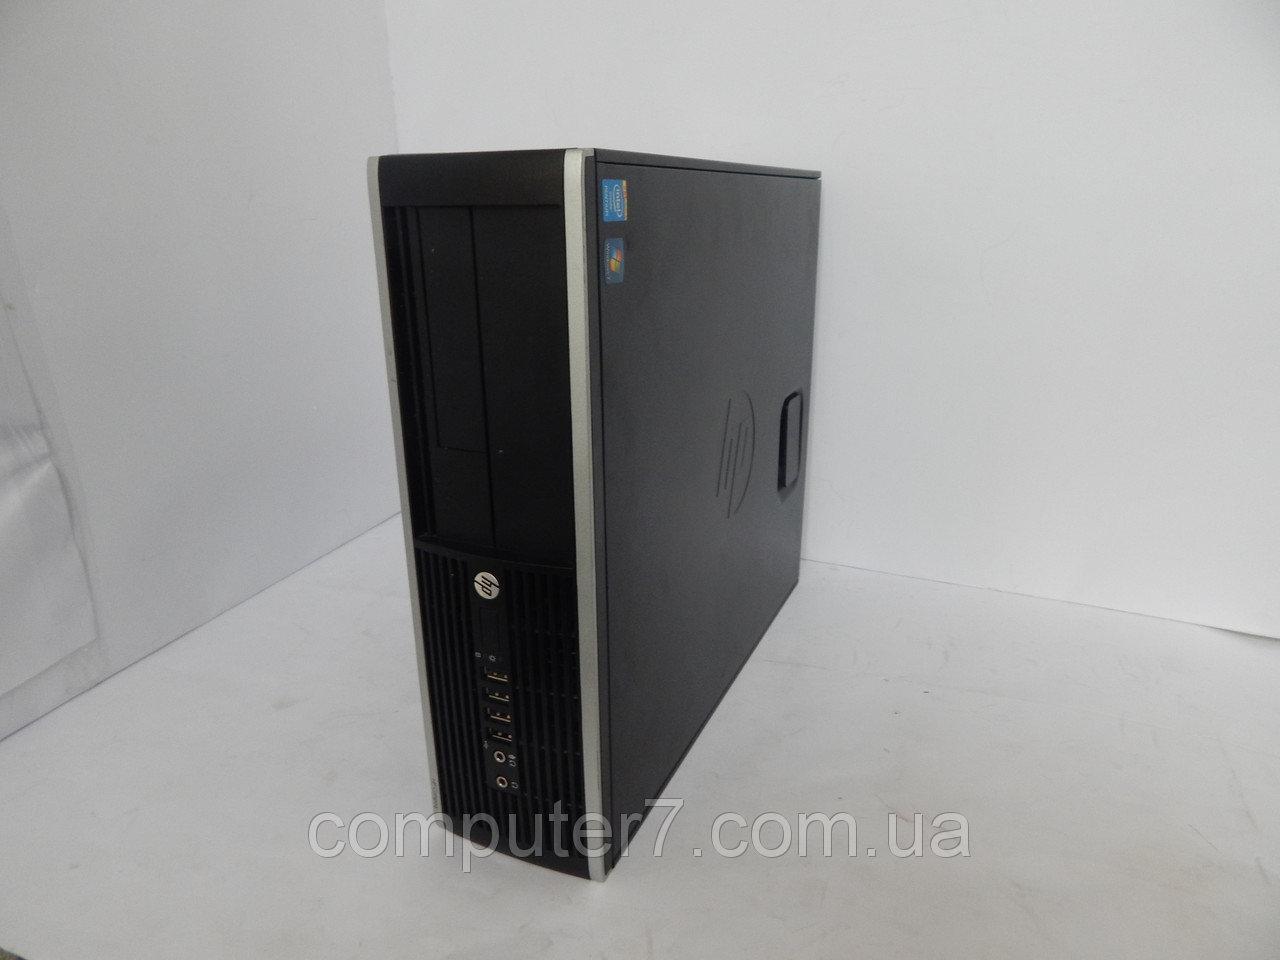 Системный блок HP 6300  i5-3570 ОЗУ 8 ГБ HDD 500 ГБ USB 3.0